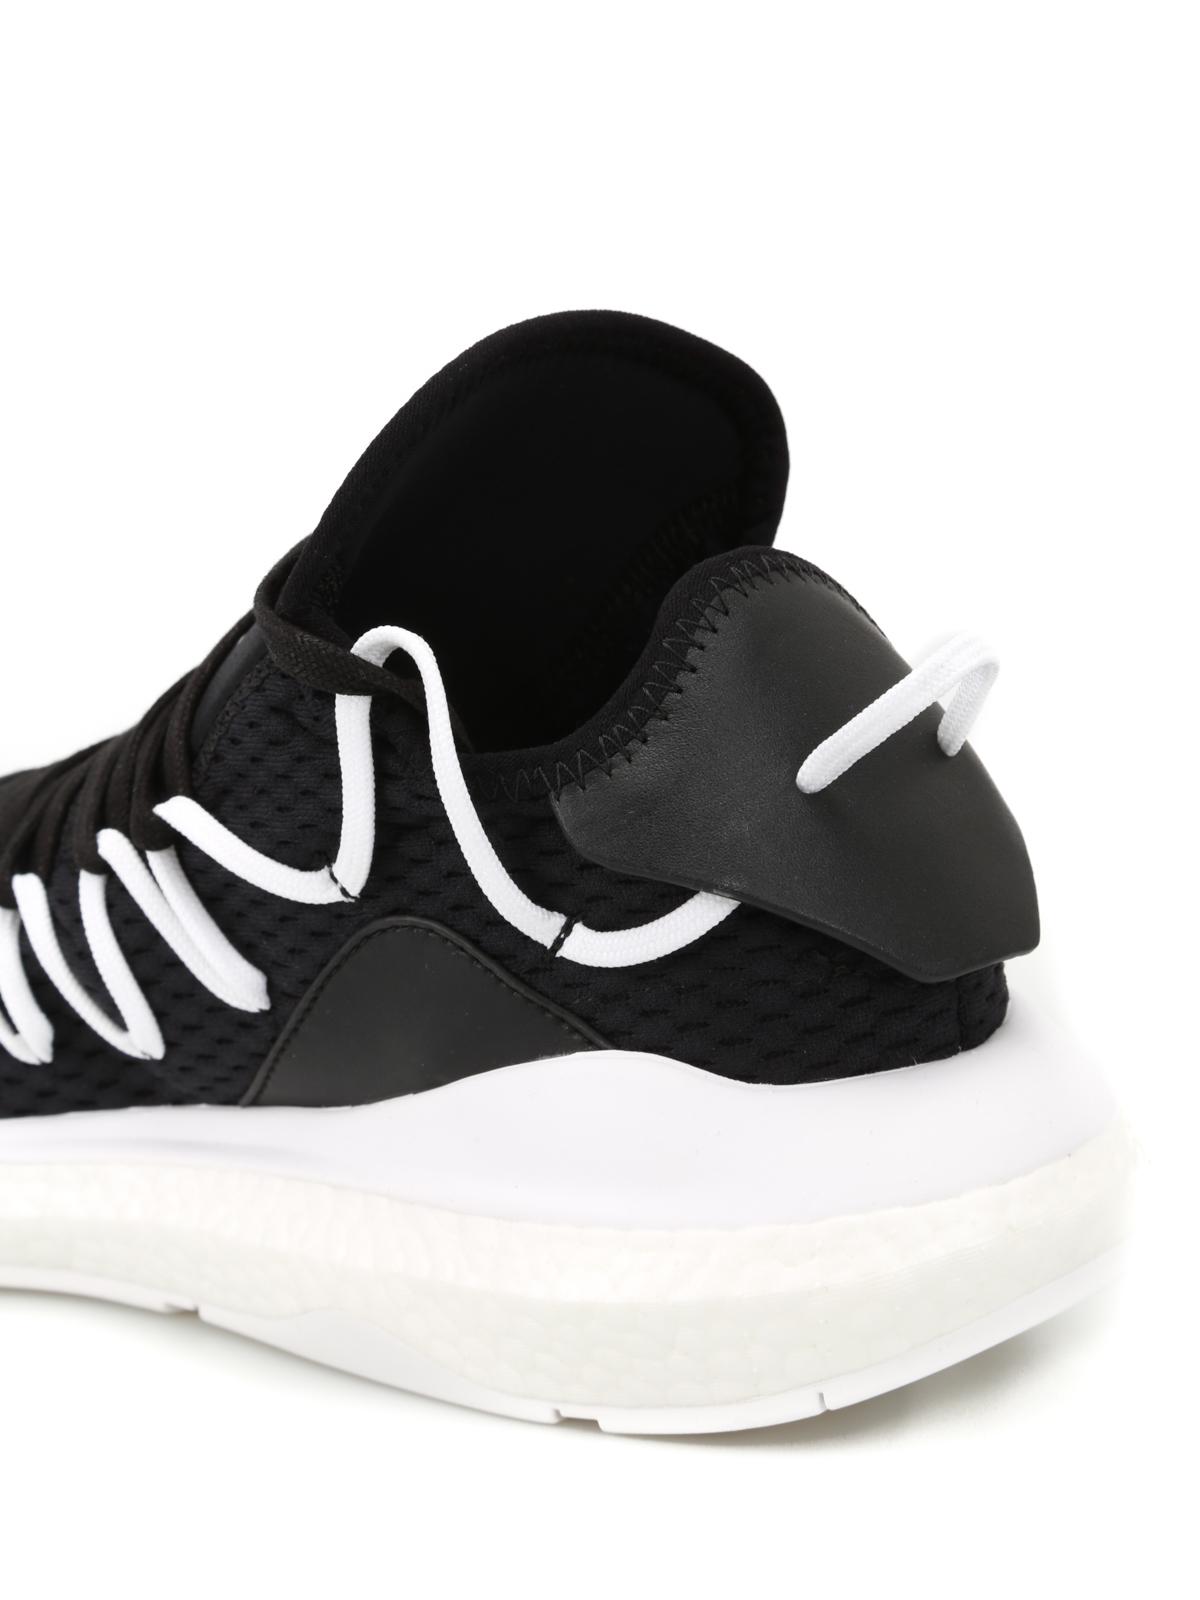 03130f7897dc Adidas Y-3 - Kusari bicolour sneakers - trainers - DB2079